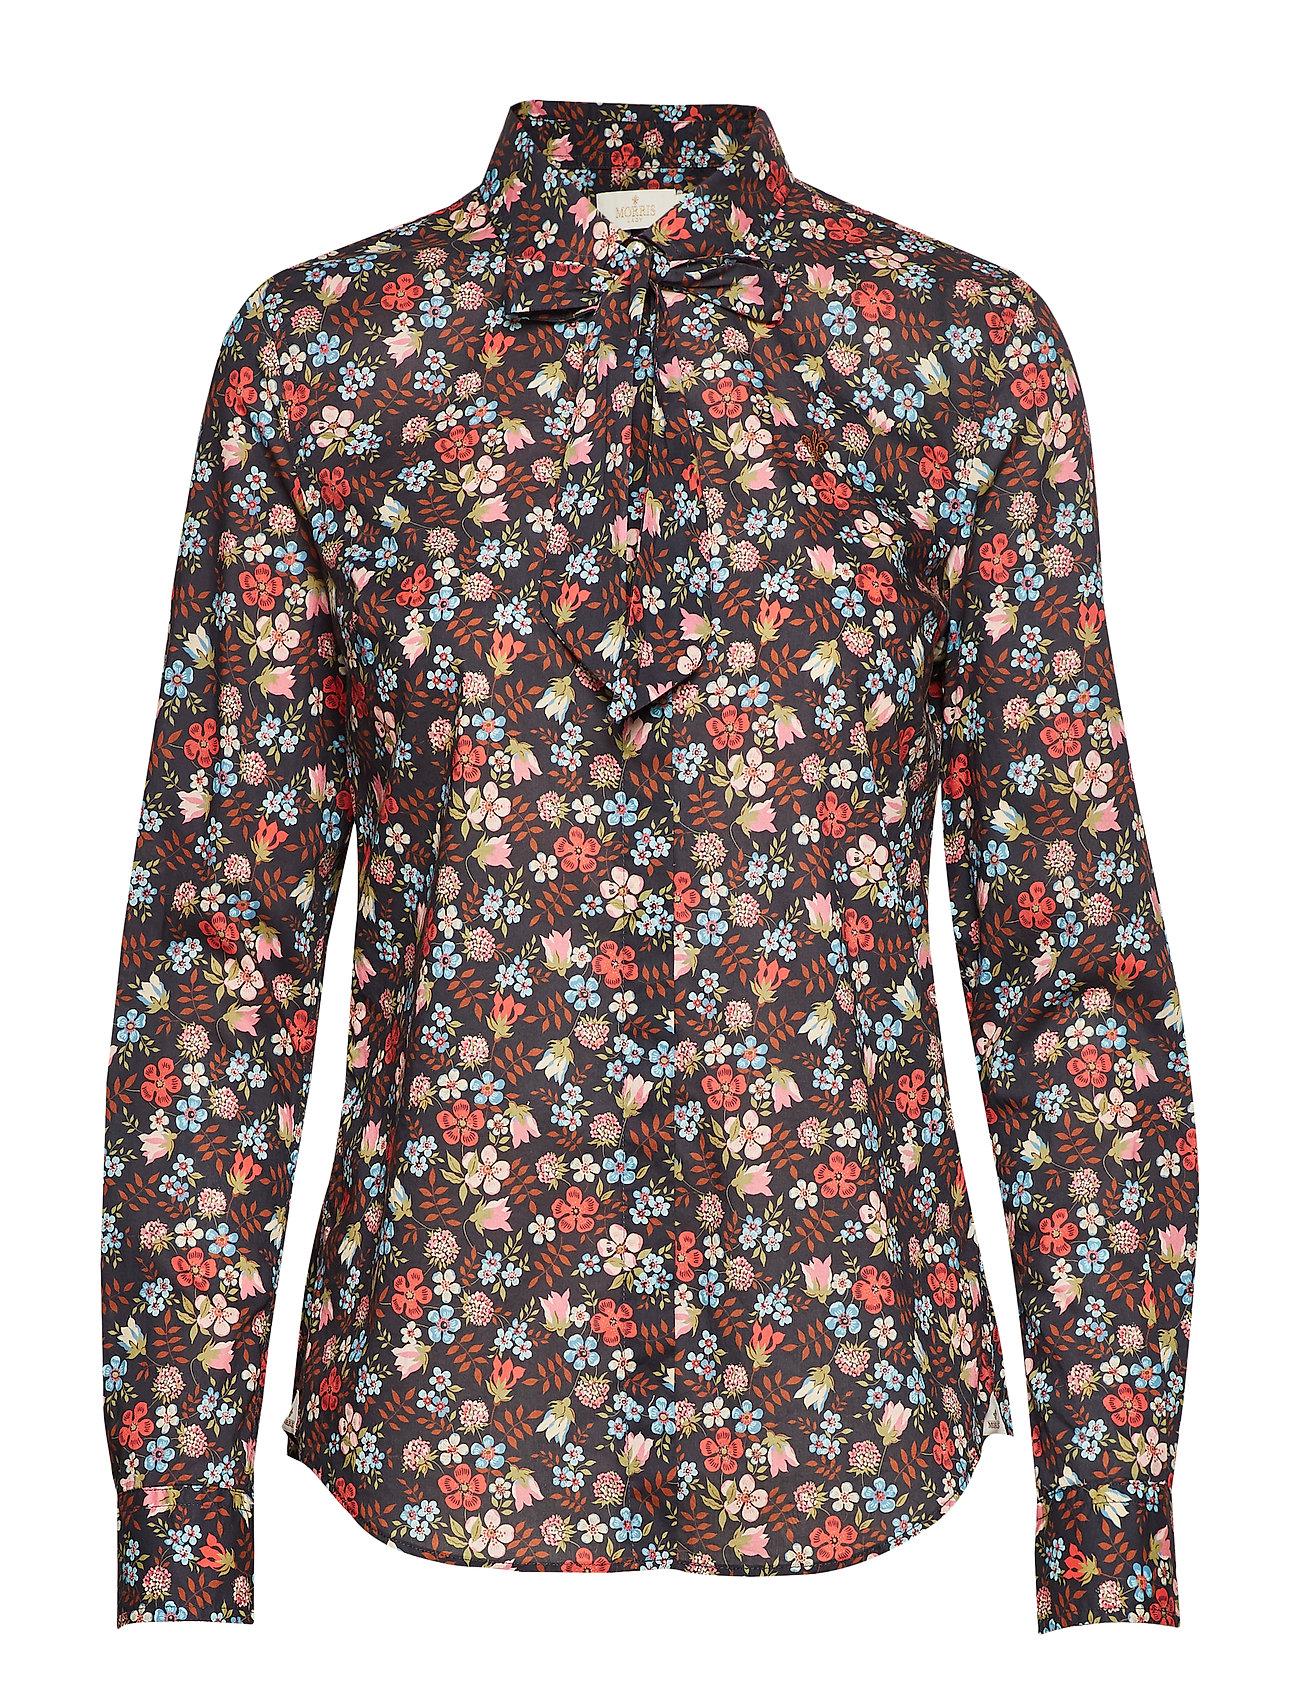 Image of Alair Liberty Fleur Shirt Langærmet Skjorte Multi/mønstret Morris Lady (3484677753)